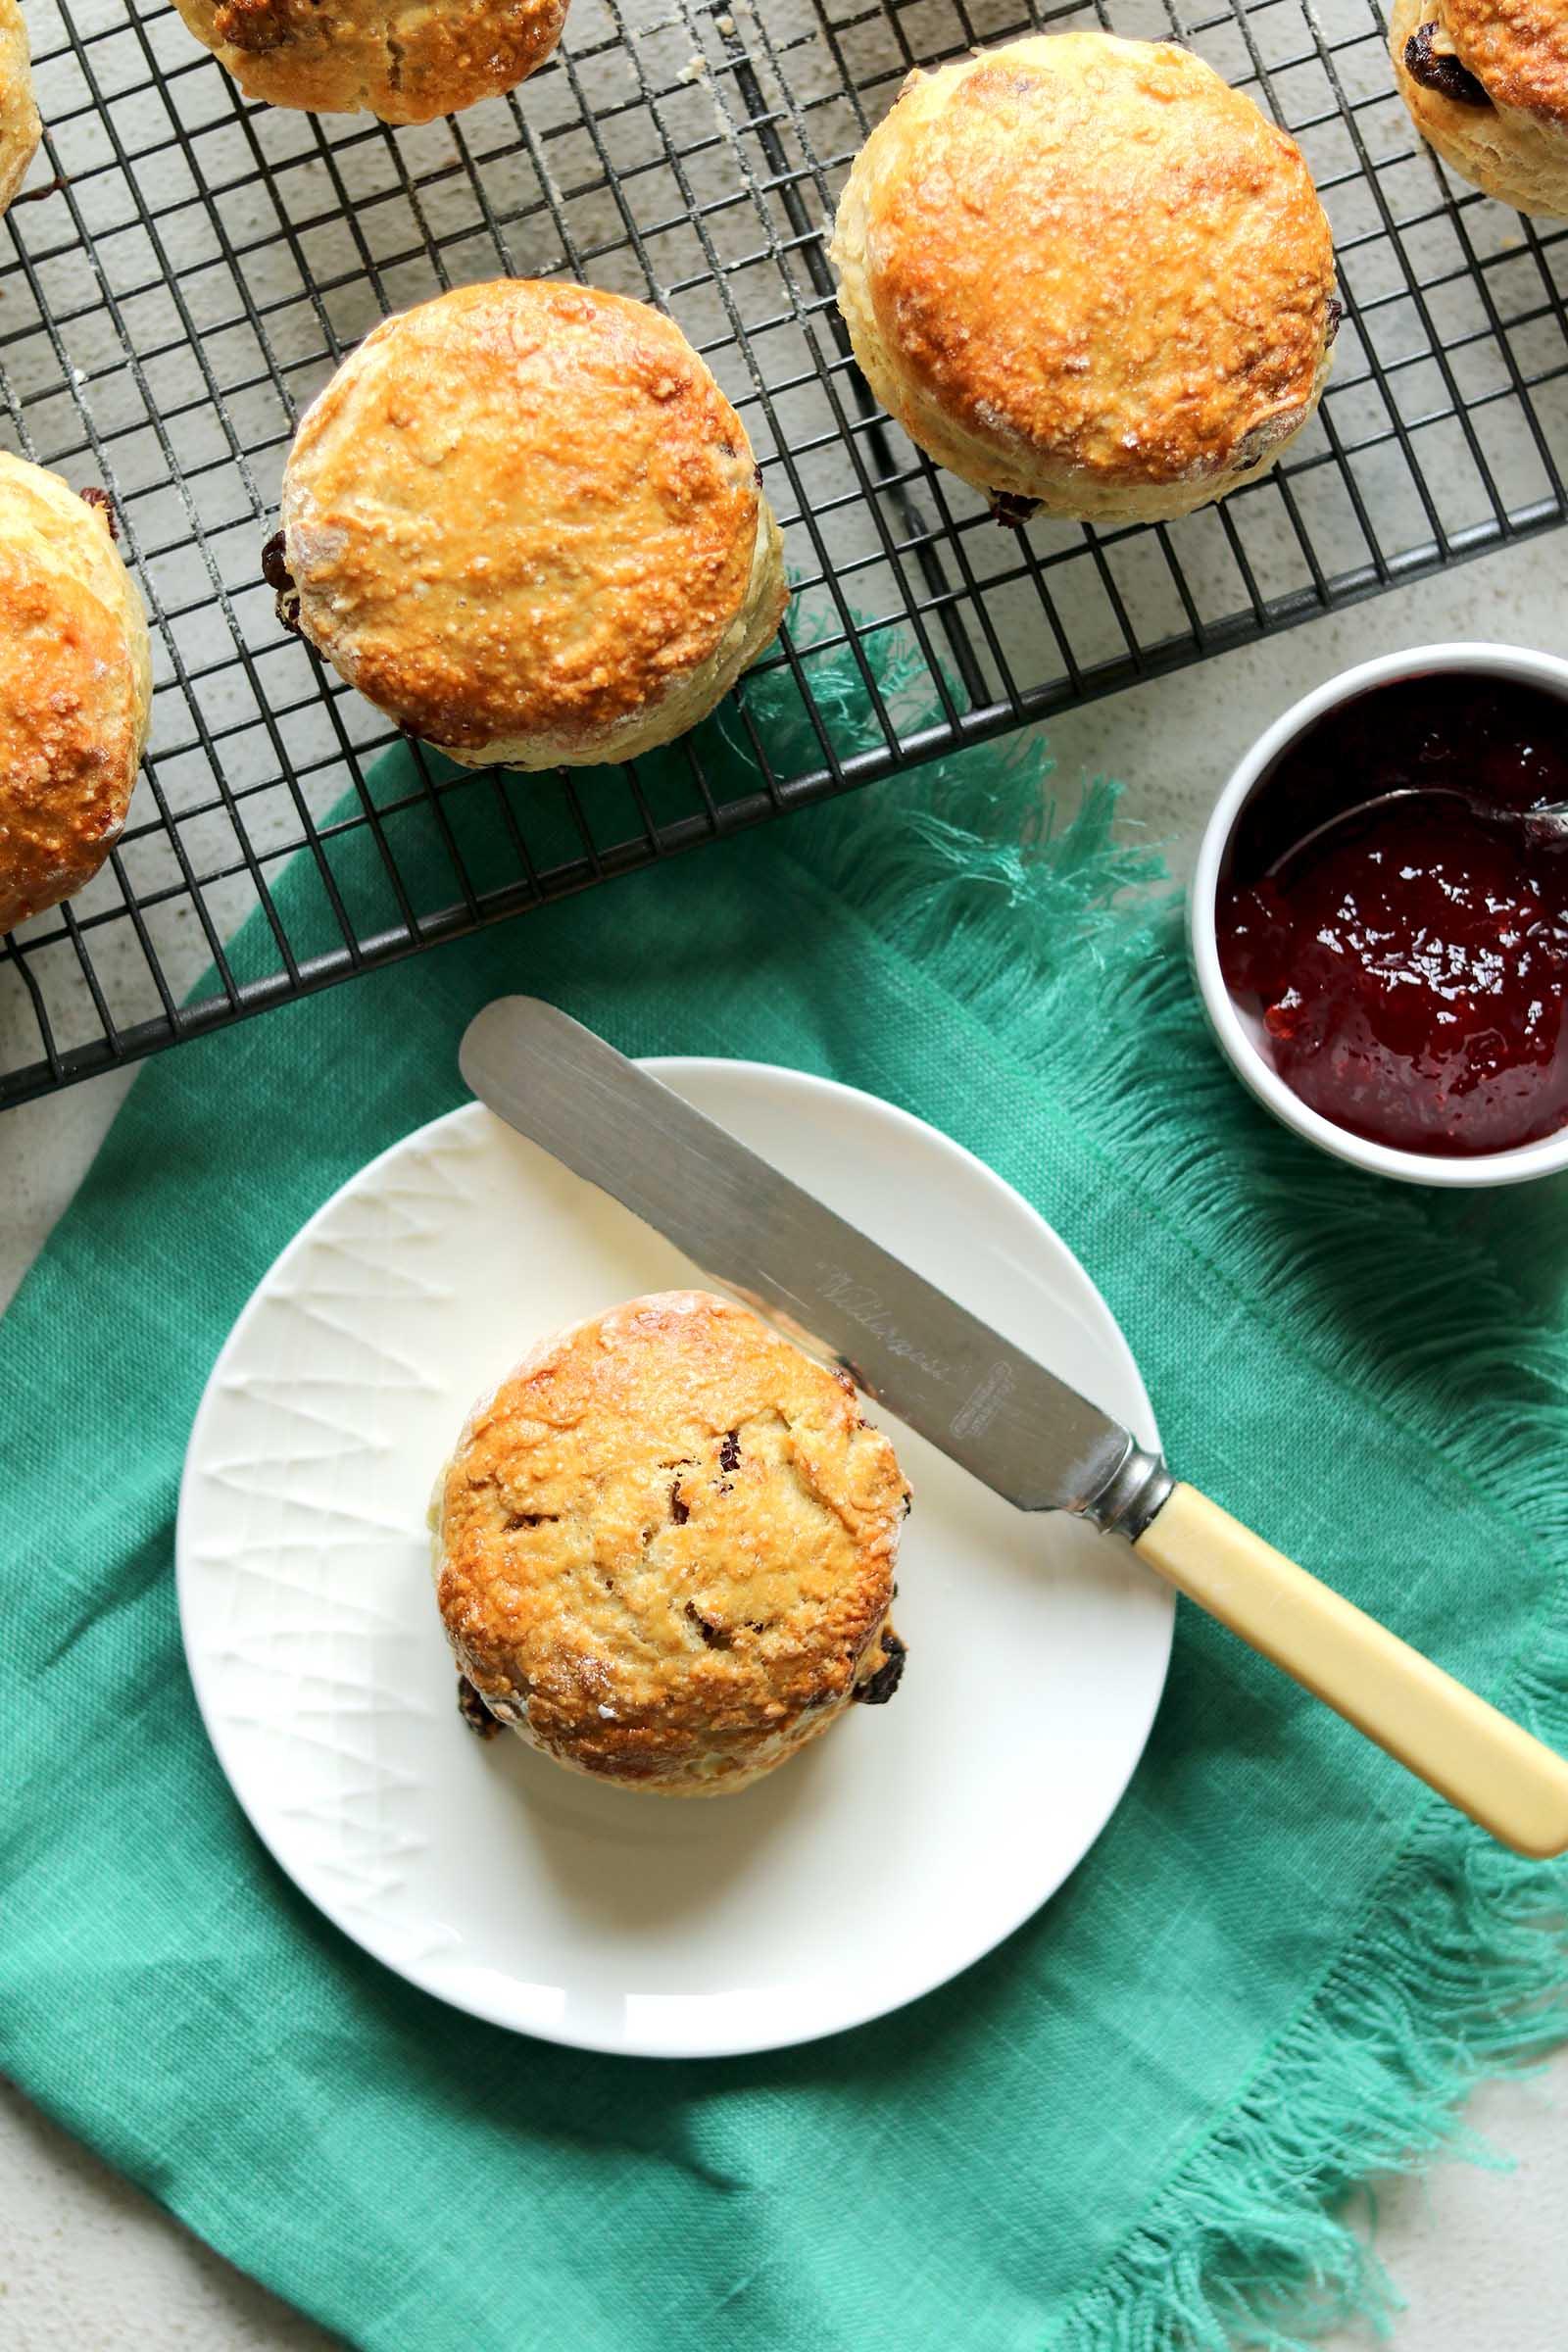 irish scones plain with tray